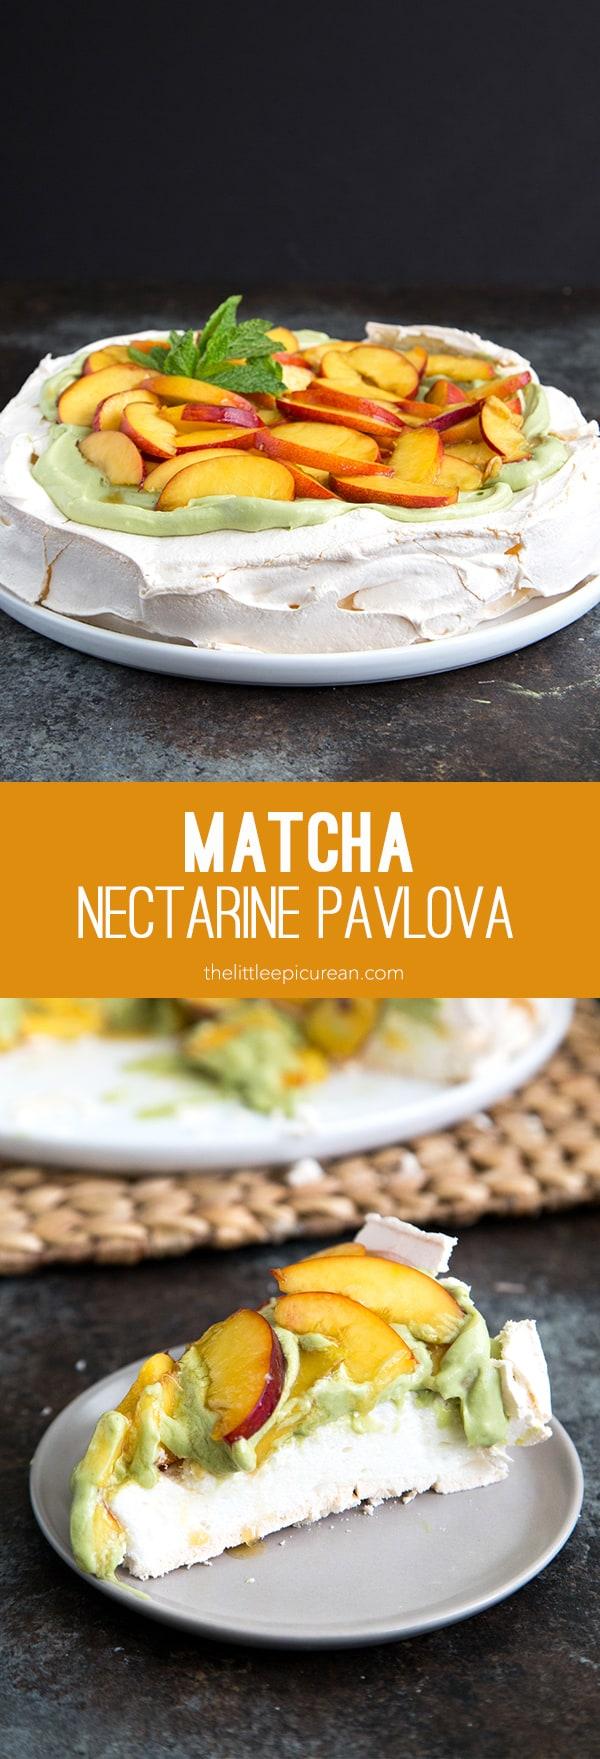 Matcha Nectarine Pavlova